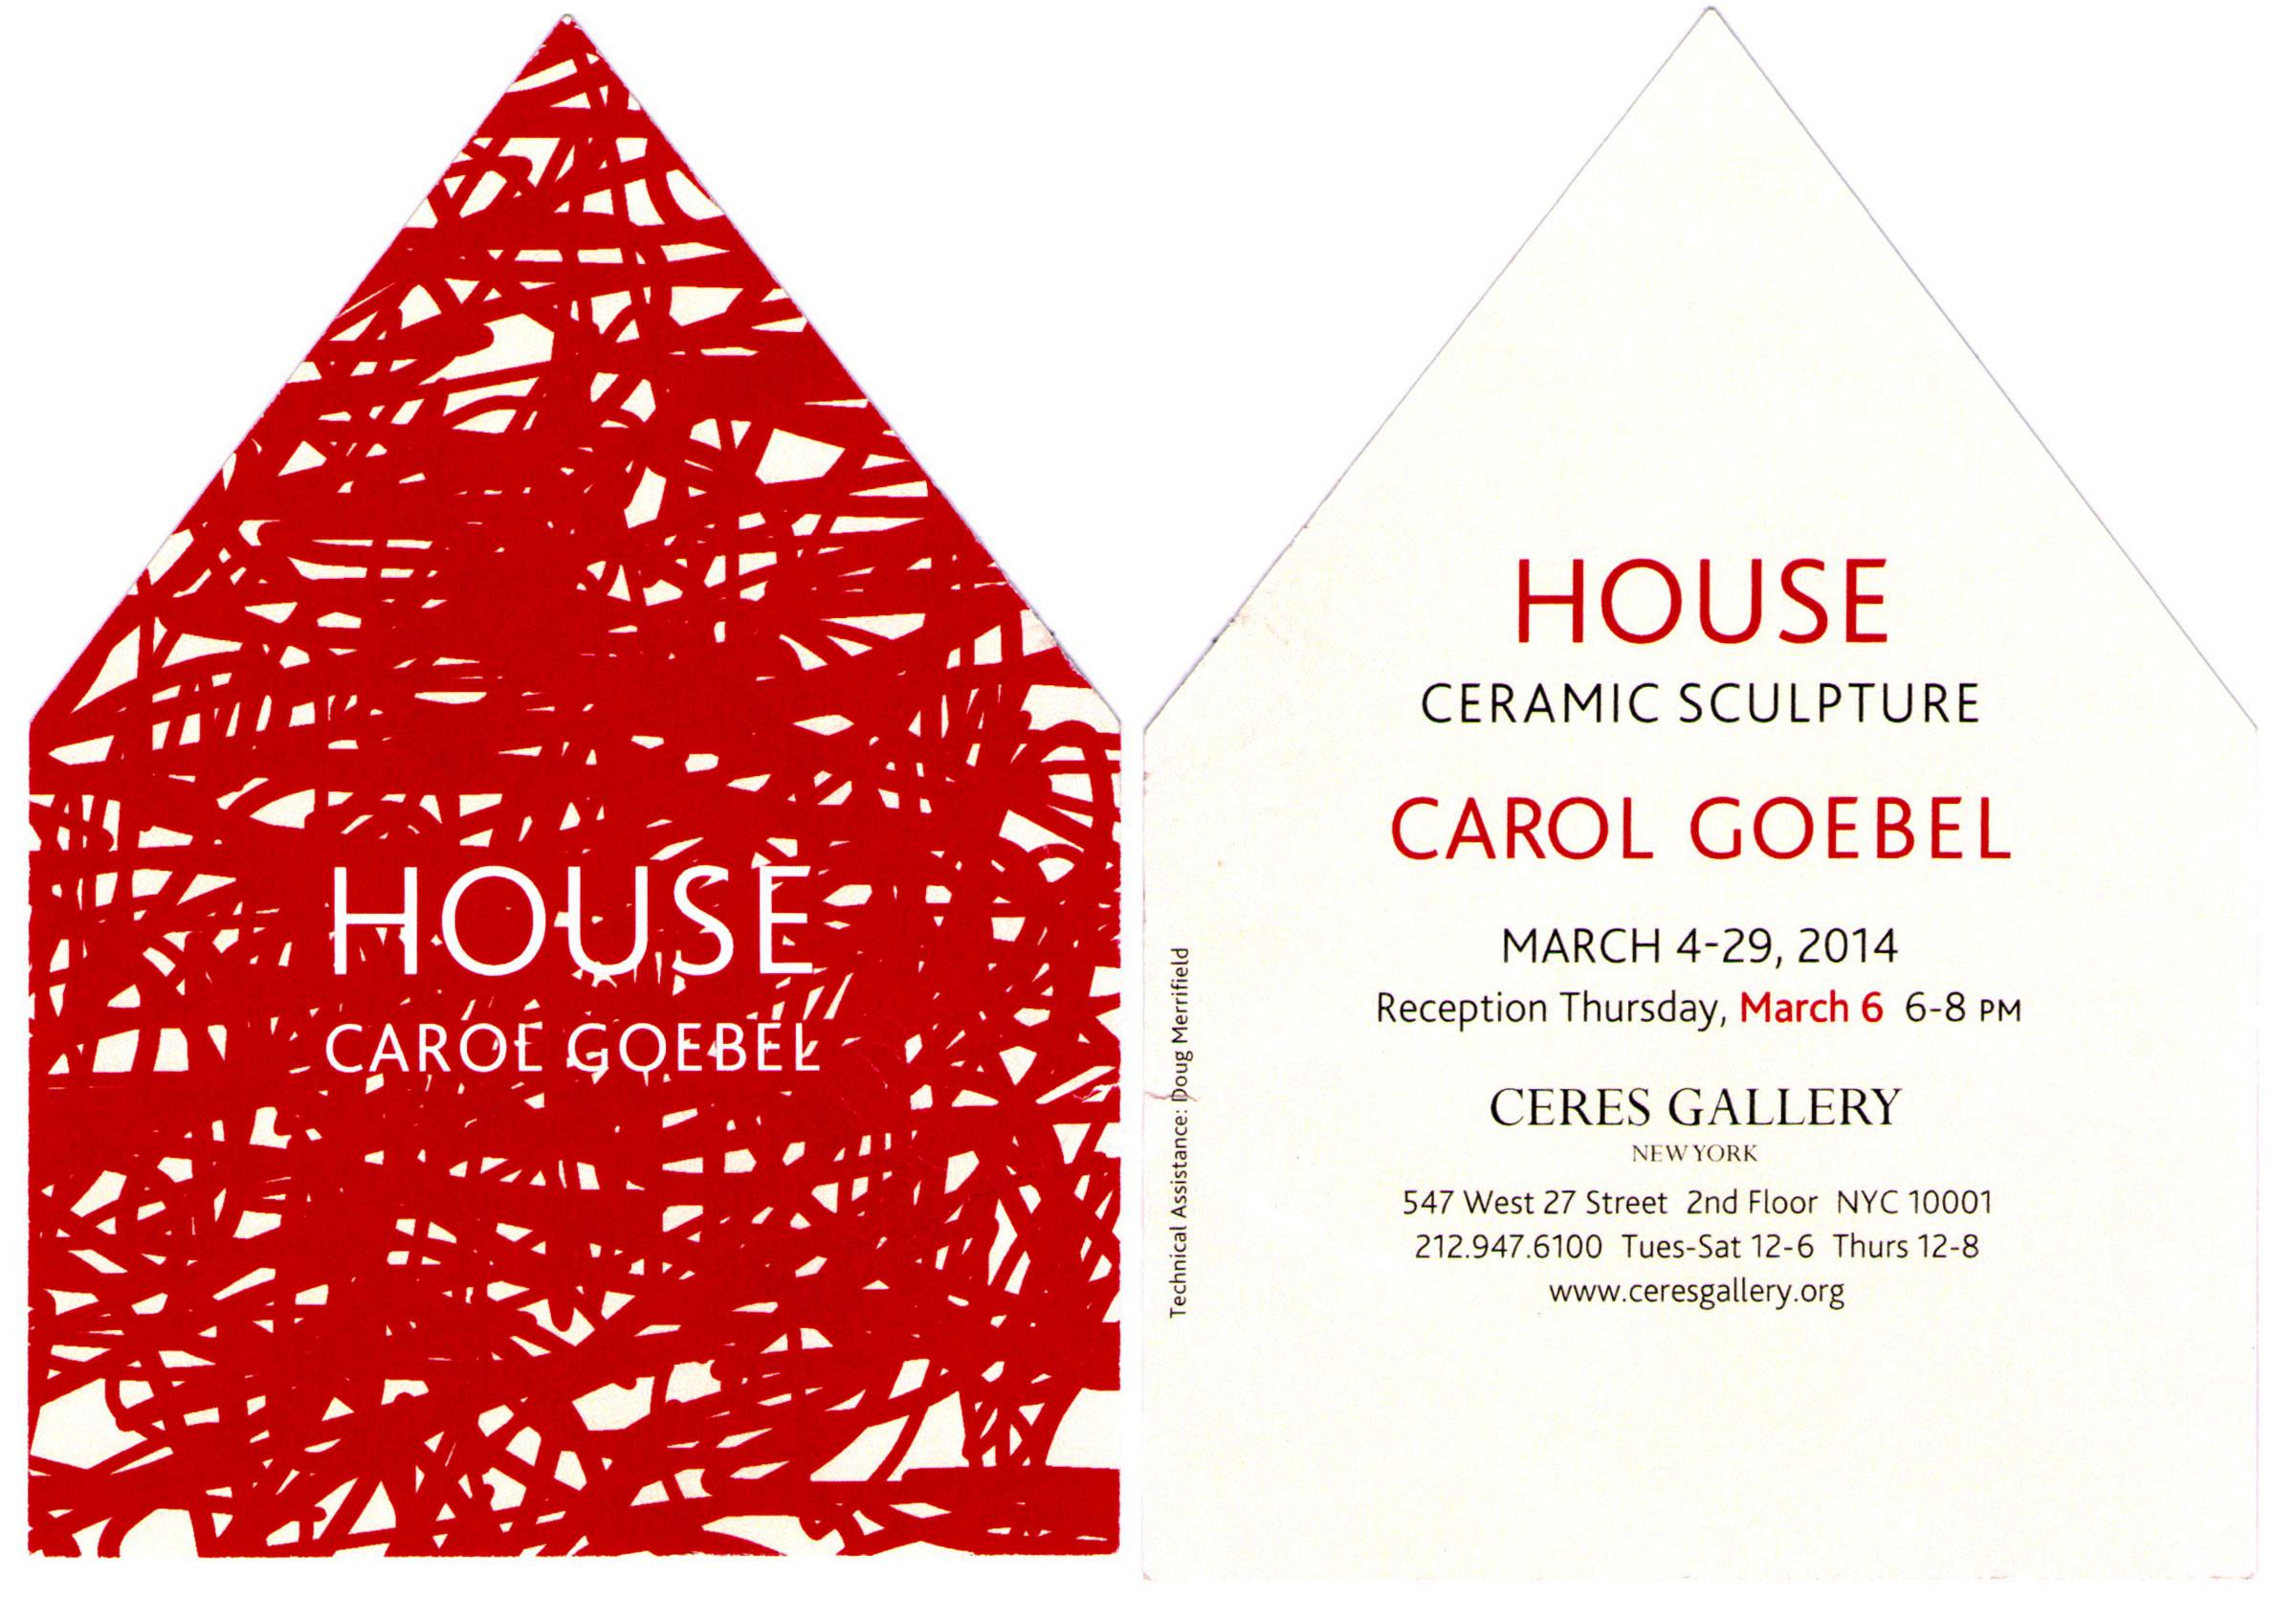 Carol Goebel - House - Ceramic Sculpture - Information Card